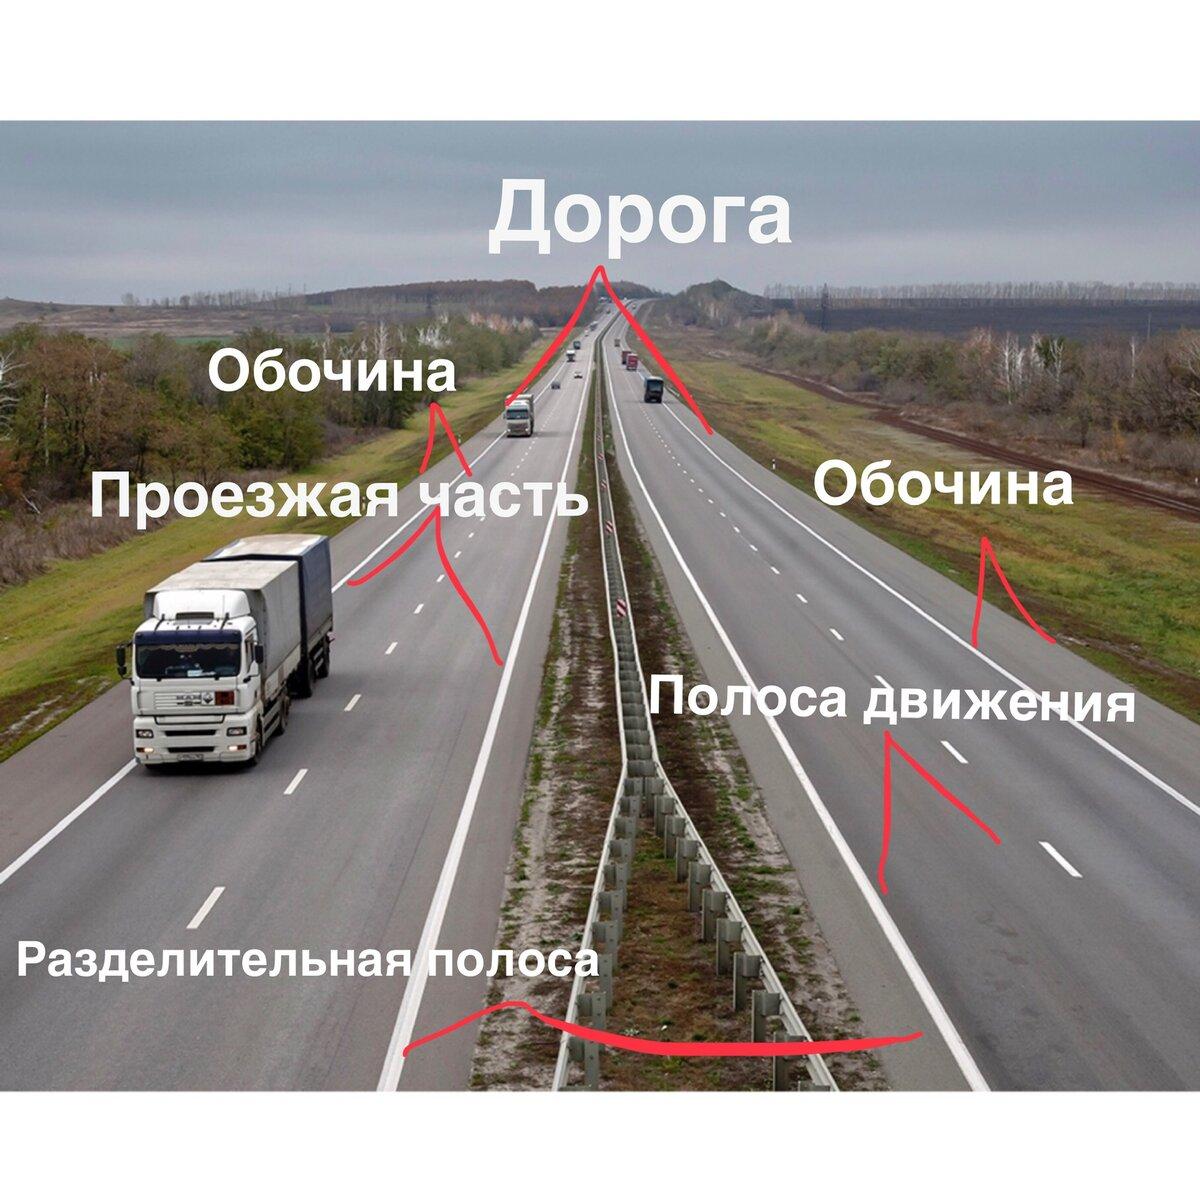 Является ли обочина частью дороги — carhack.ru